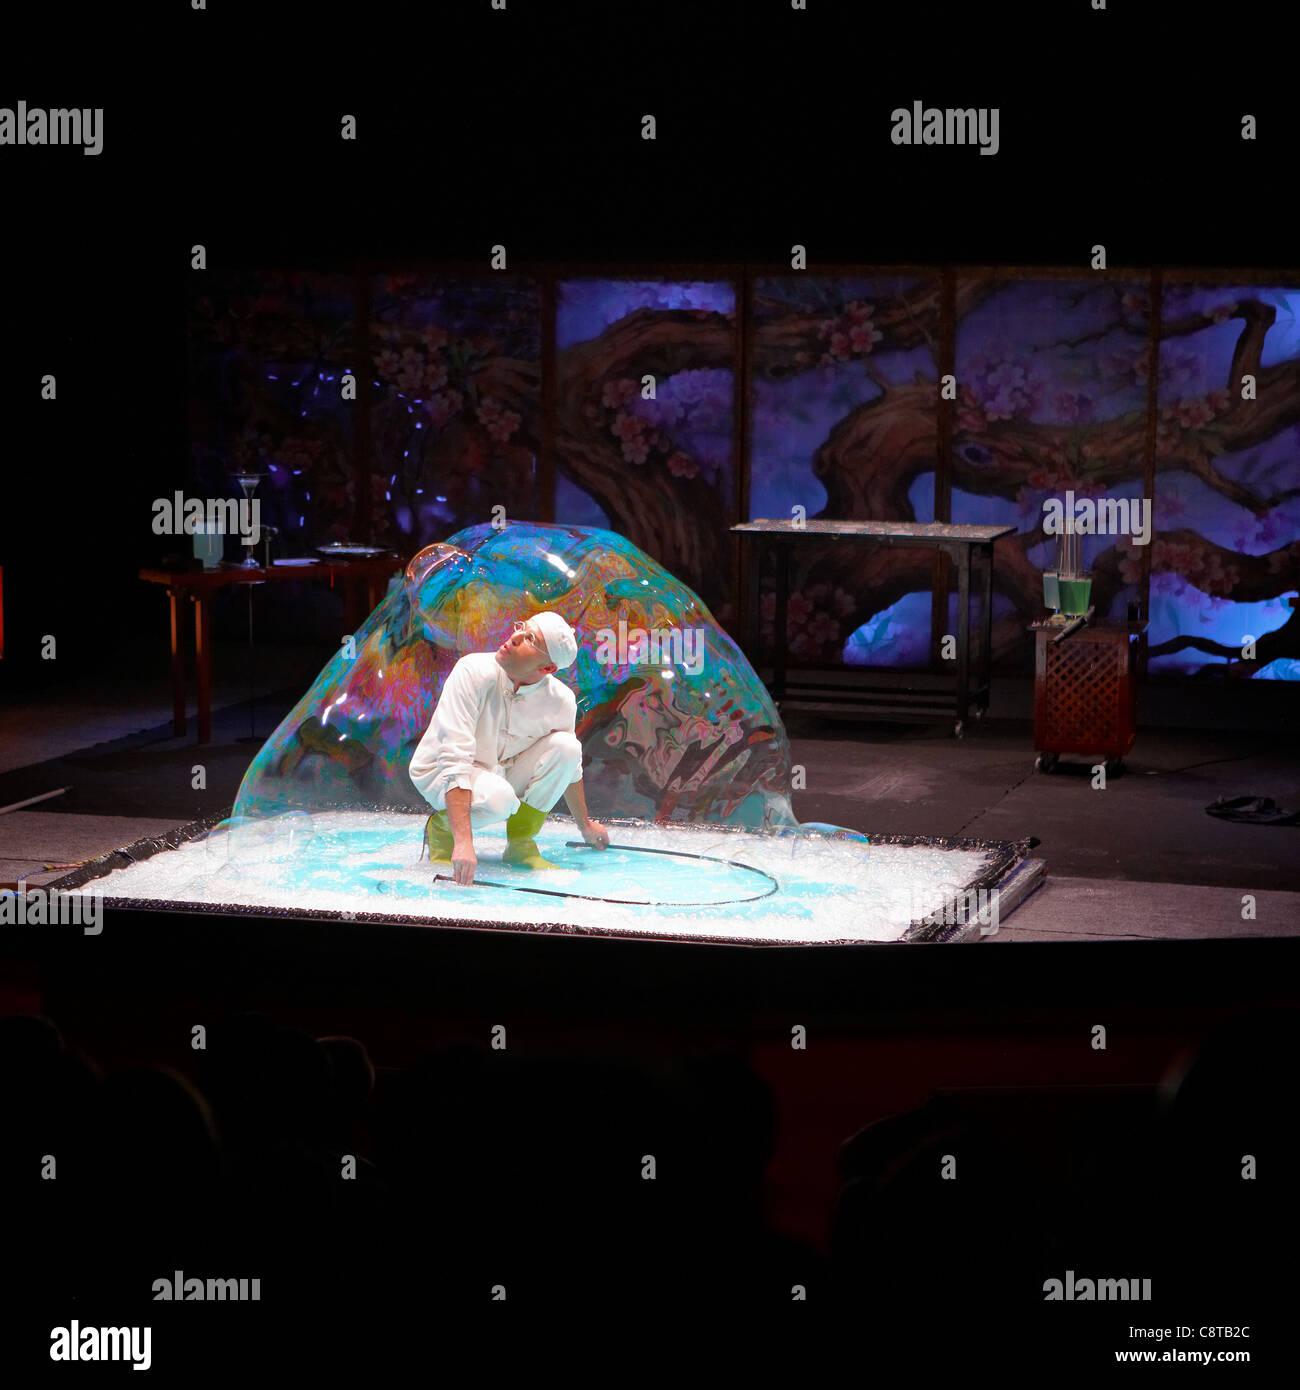 Man inside soap bubble.Port Aventura amusement park, Salou, Catalonia, Spain. - Stock Image